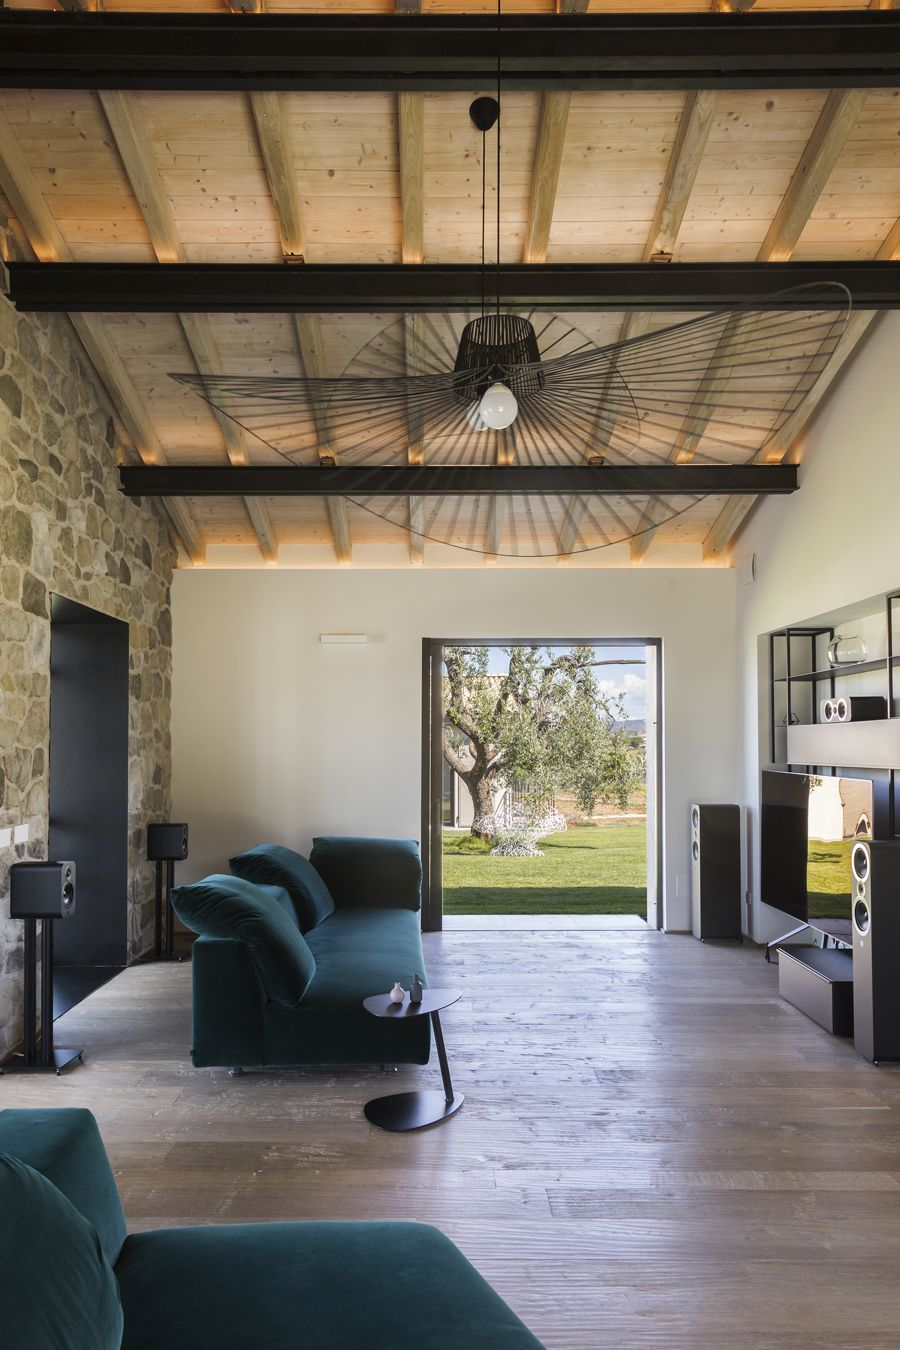 Capalbio Barn House - image 4